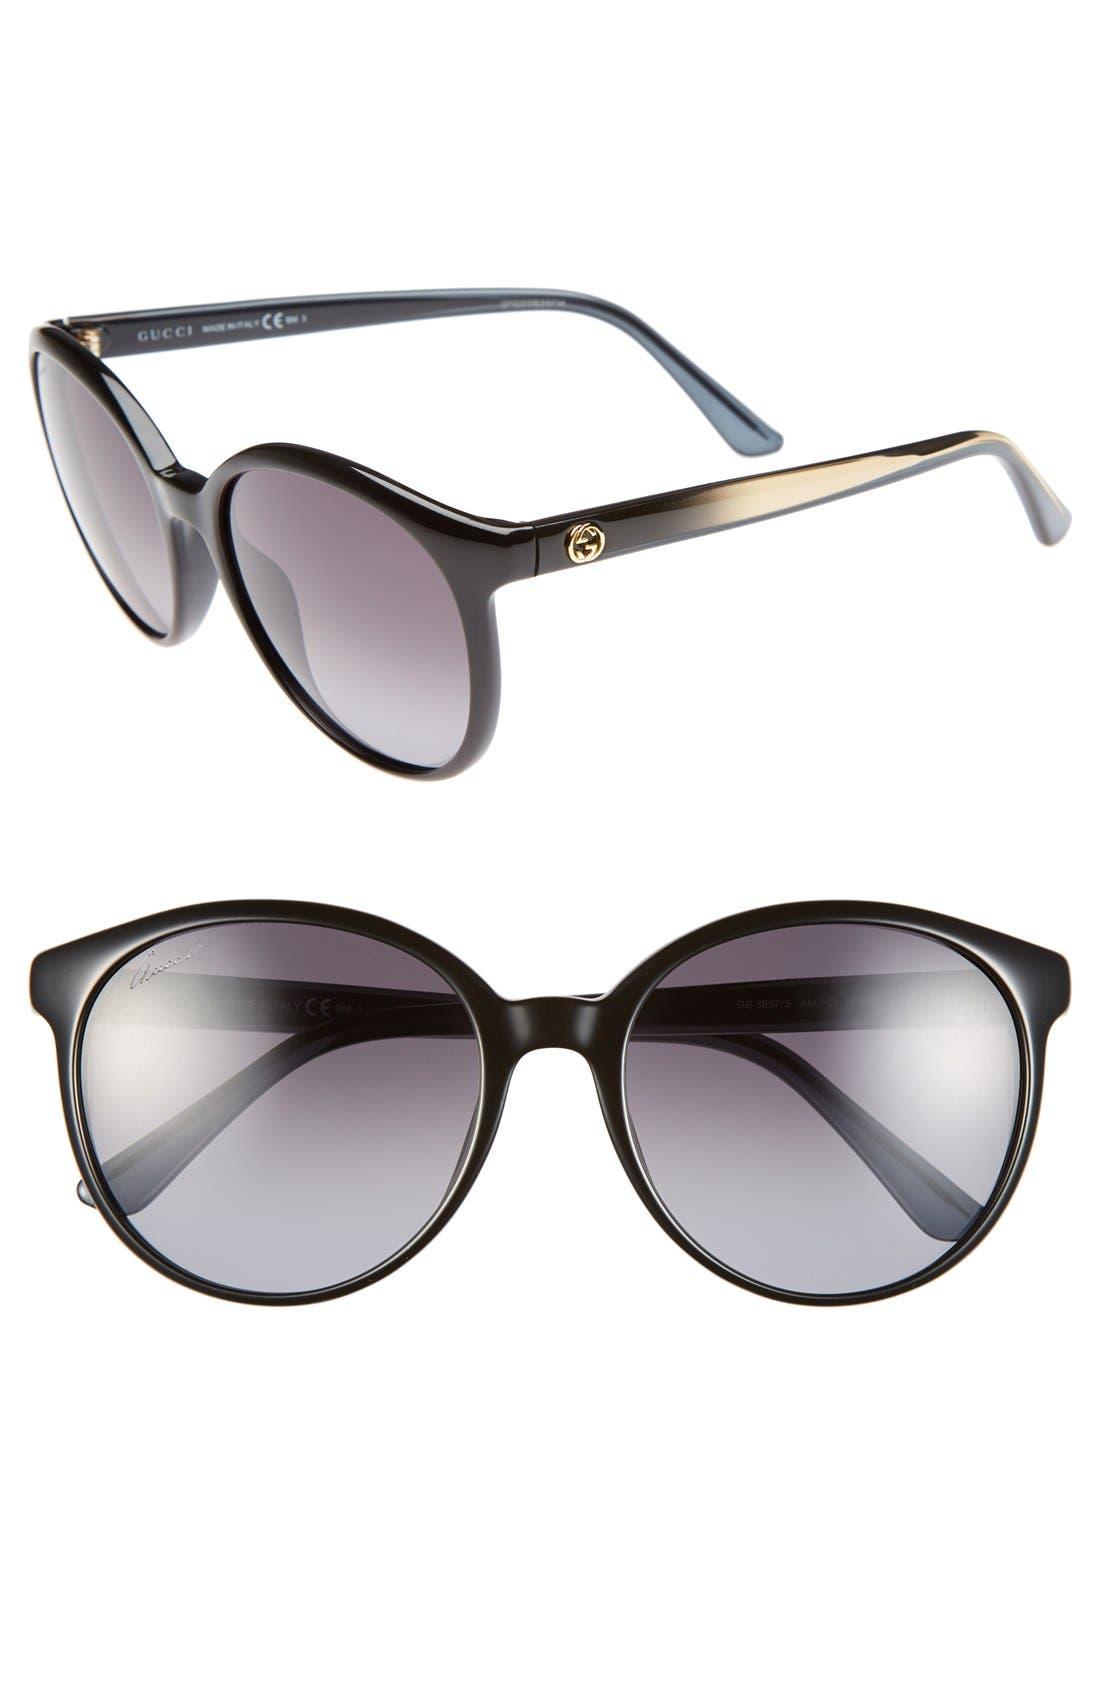 Alternate Image 1 Selected - Gucci 56mm Retro Sunglasses